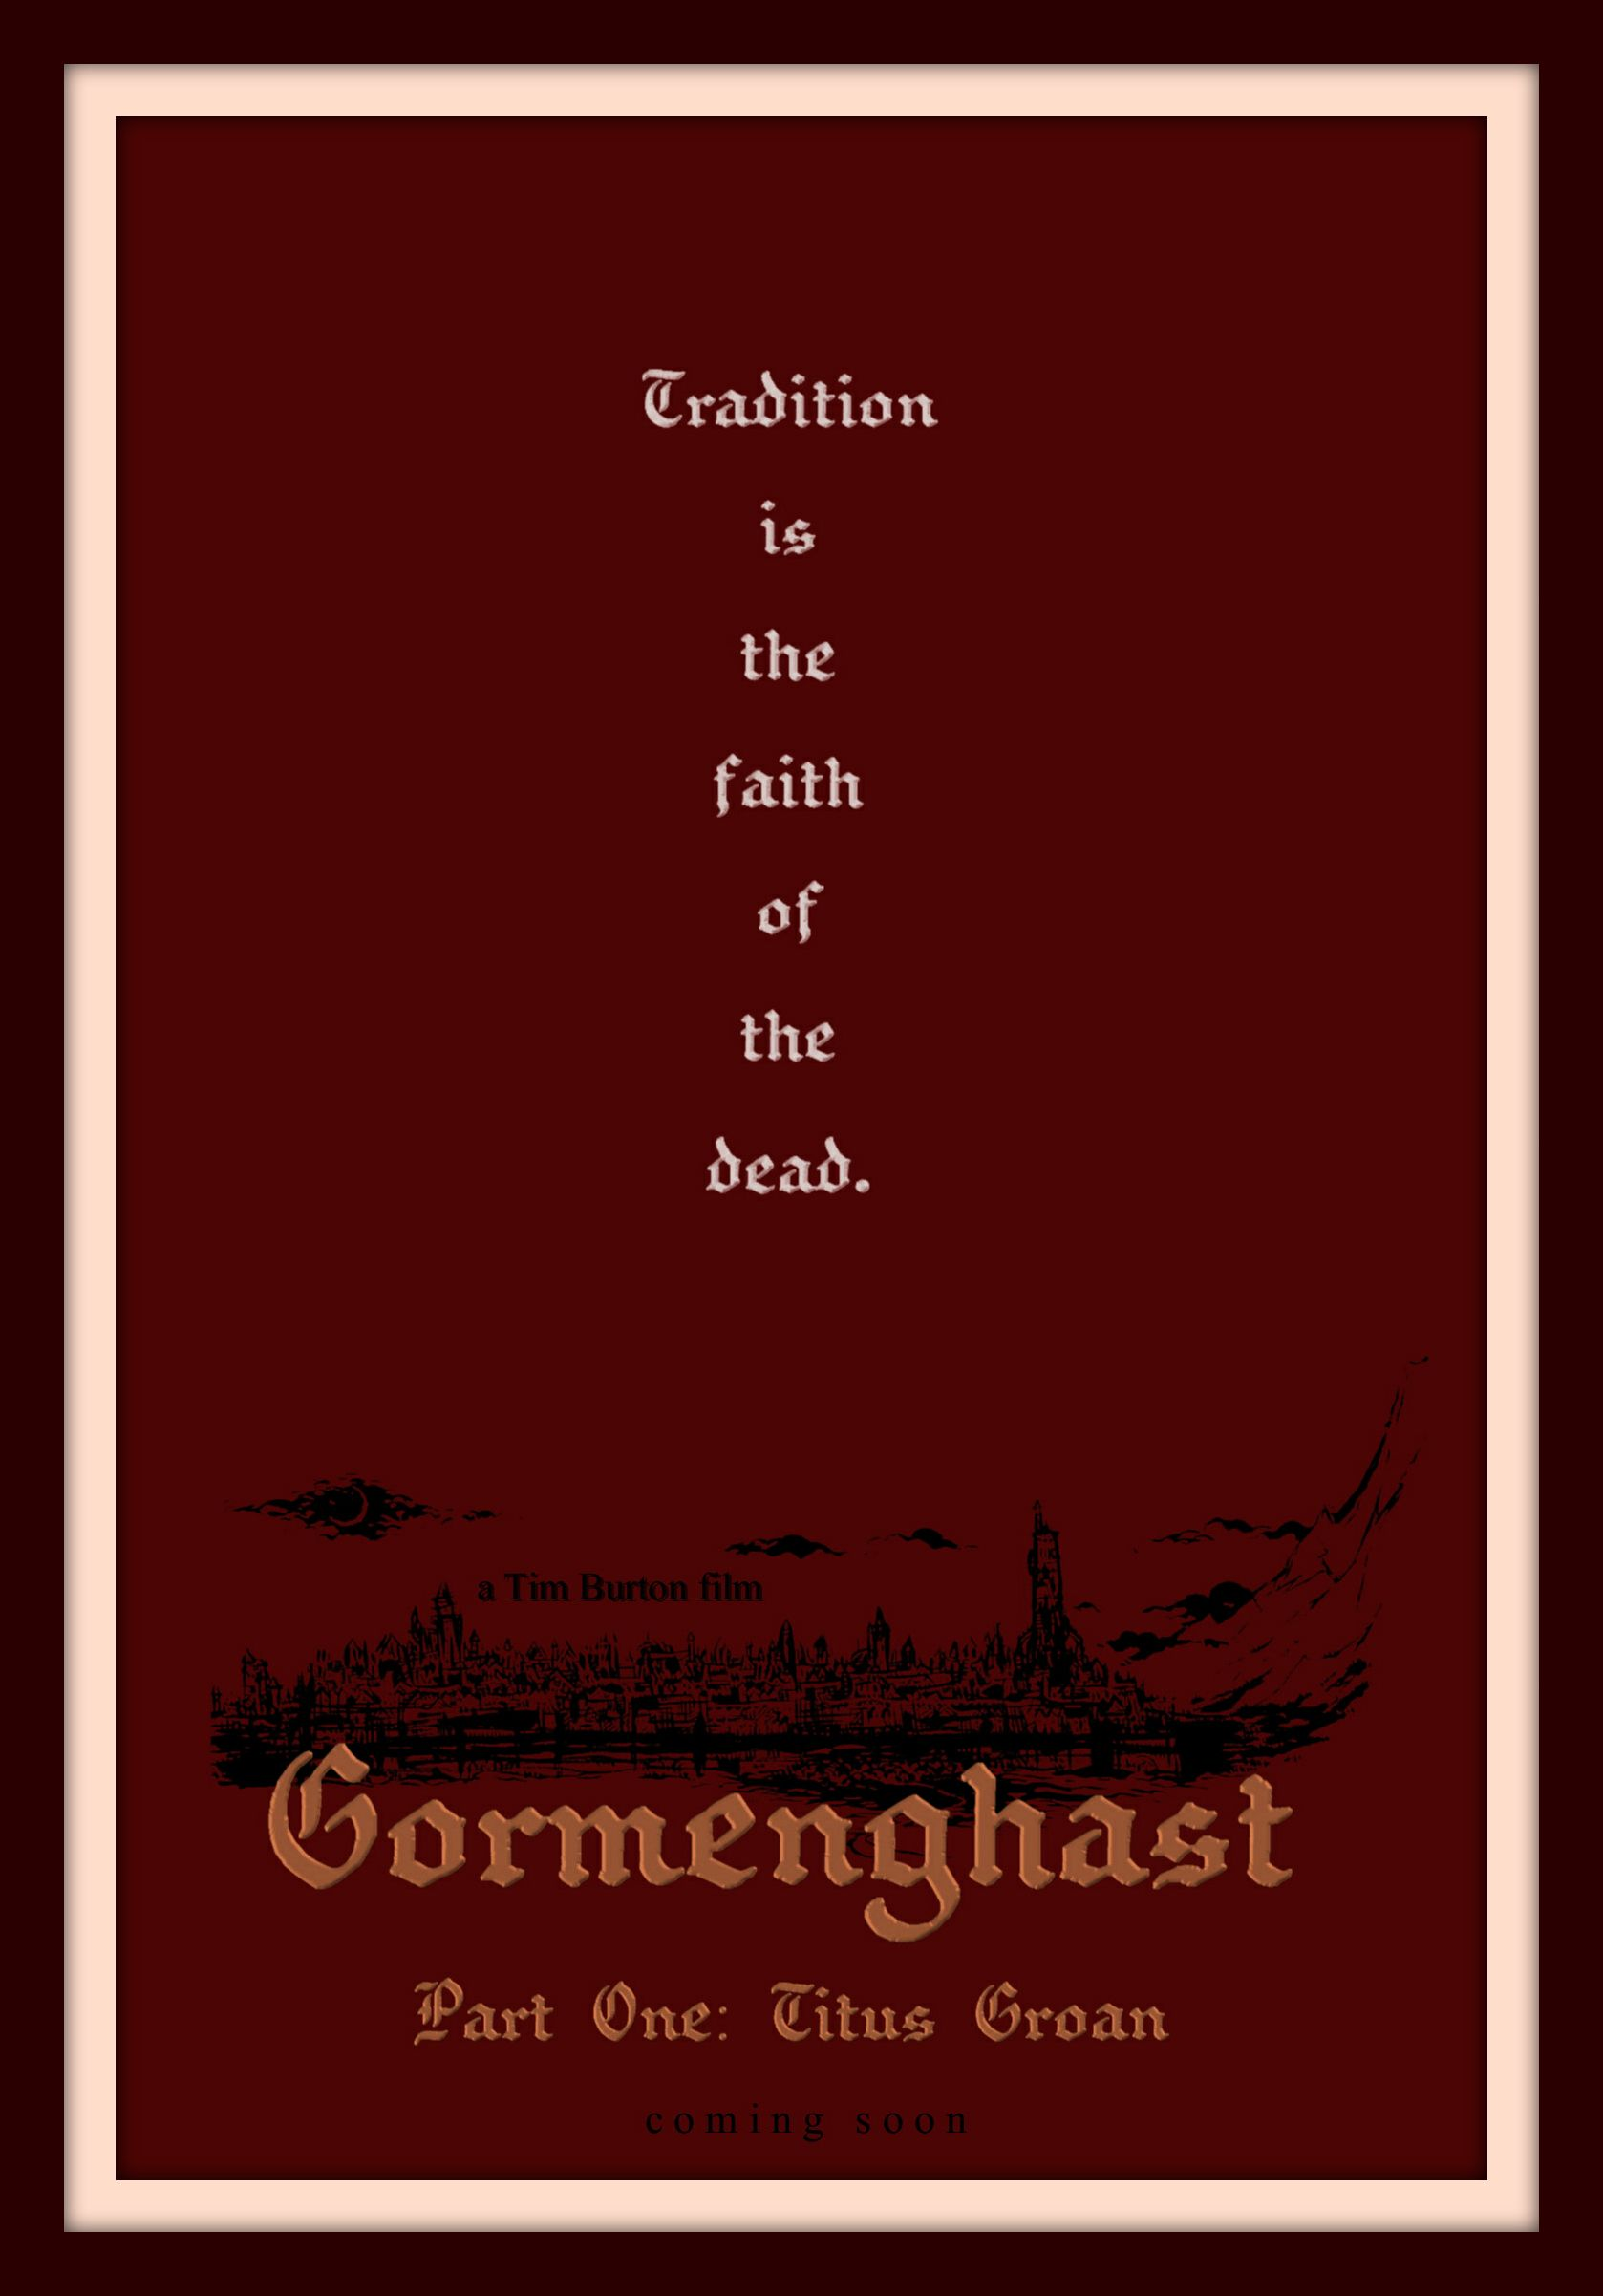 Gormenghast (1) version 2 (29-11-2015).